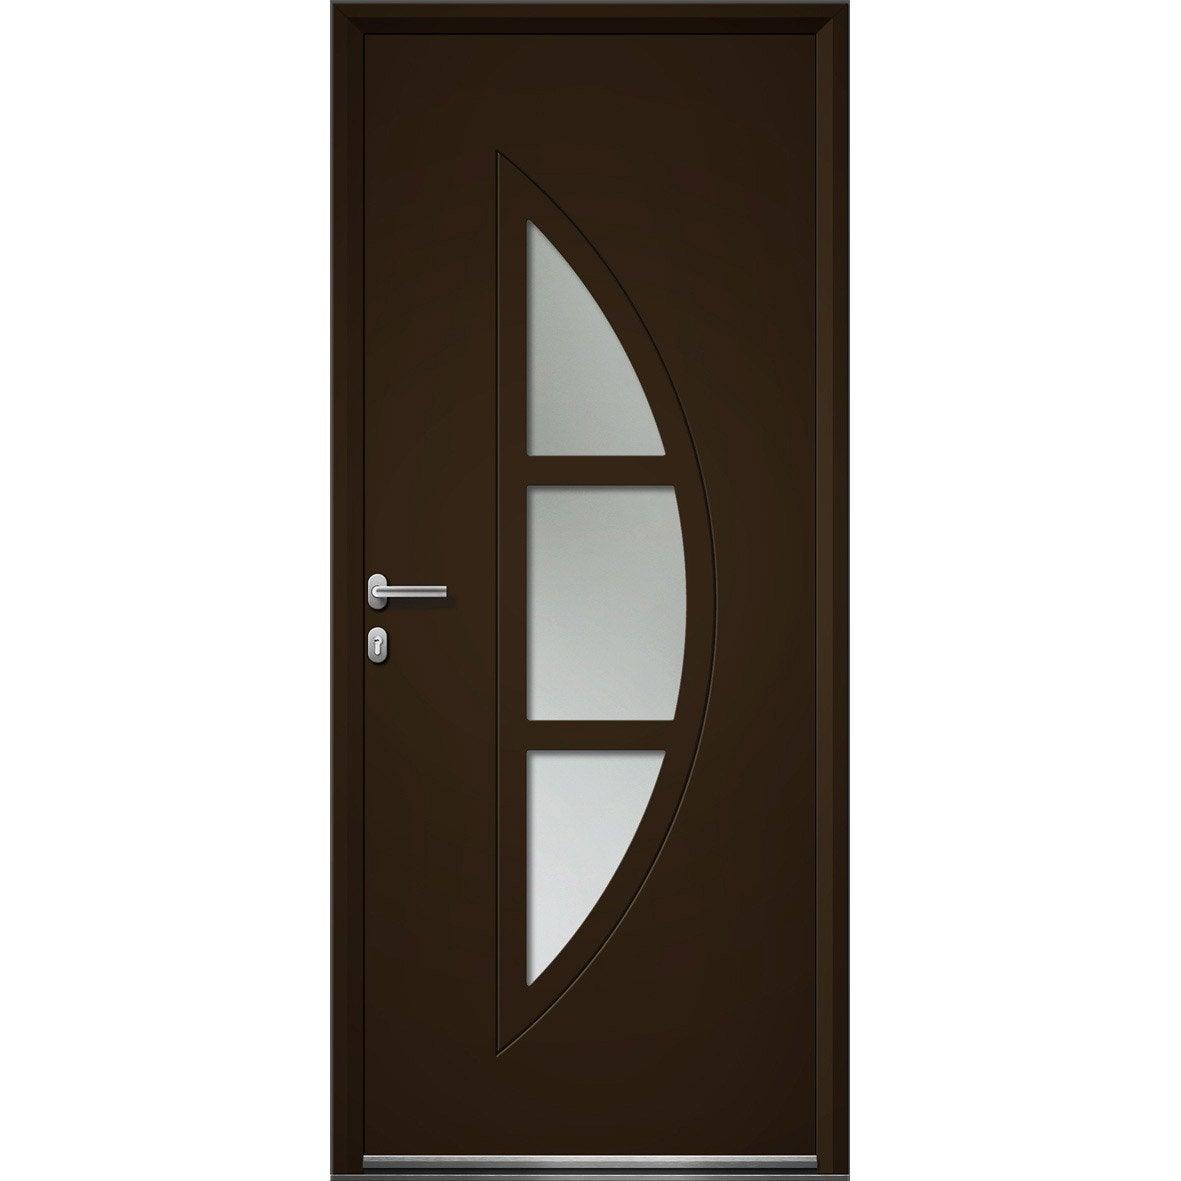 Porte d 39 entr e sur mesure en aluminium omaha artens for Porte d entree aluminium prix